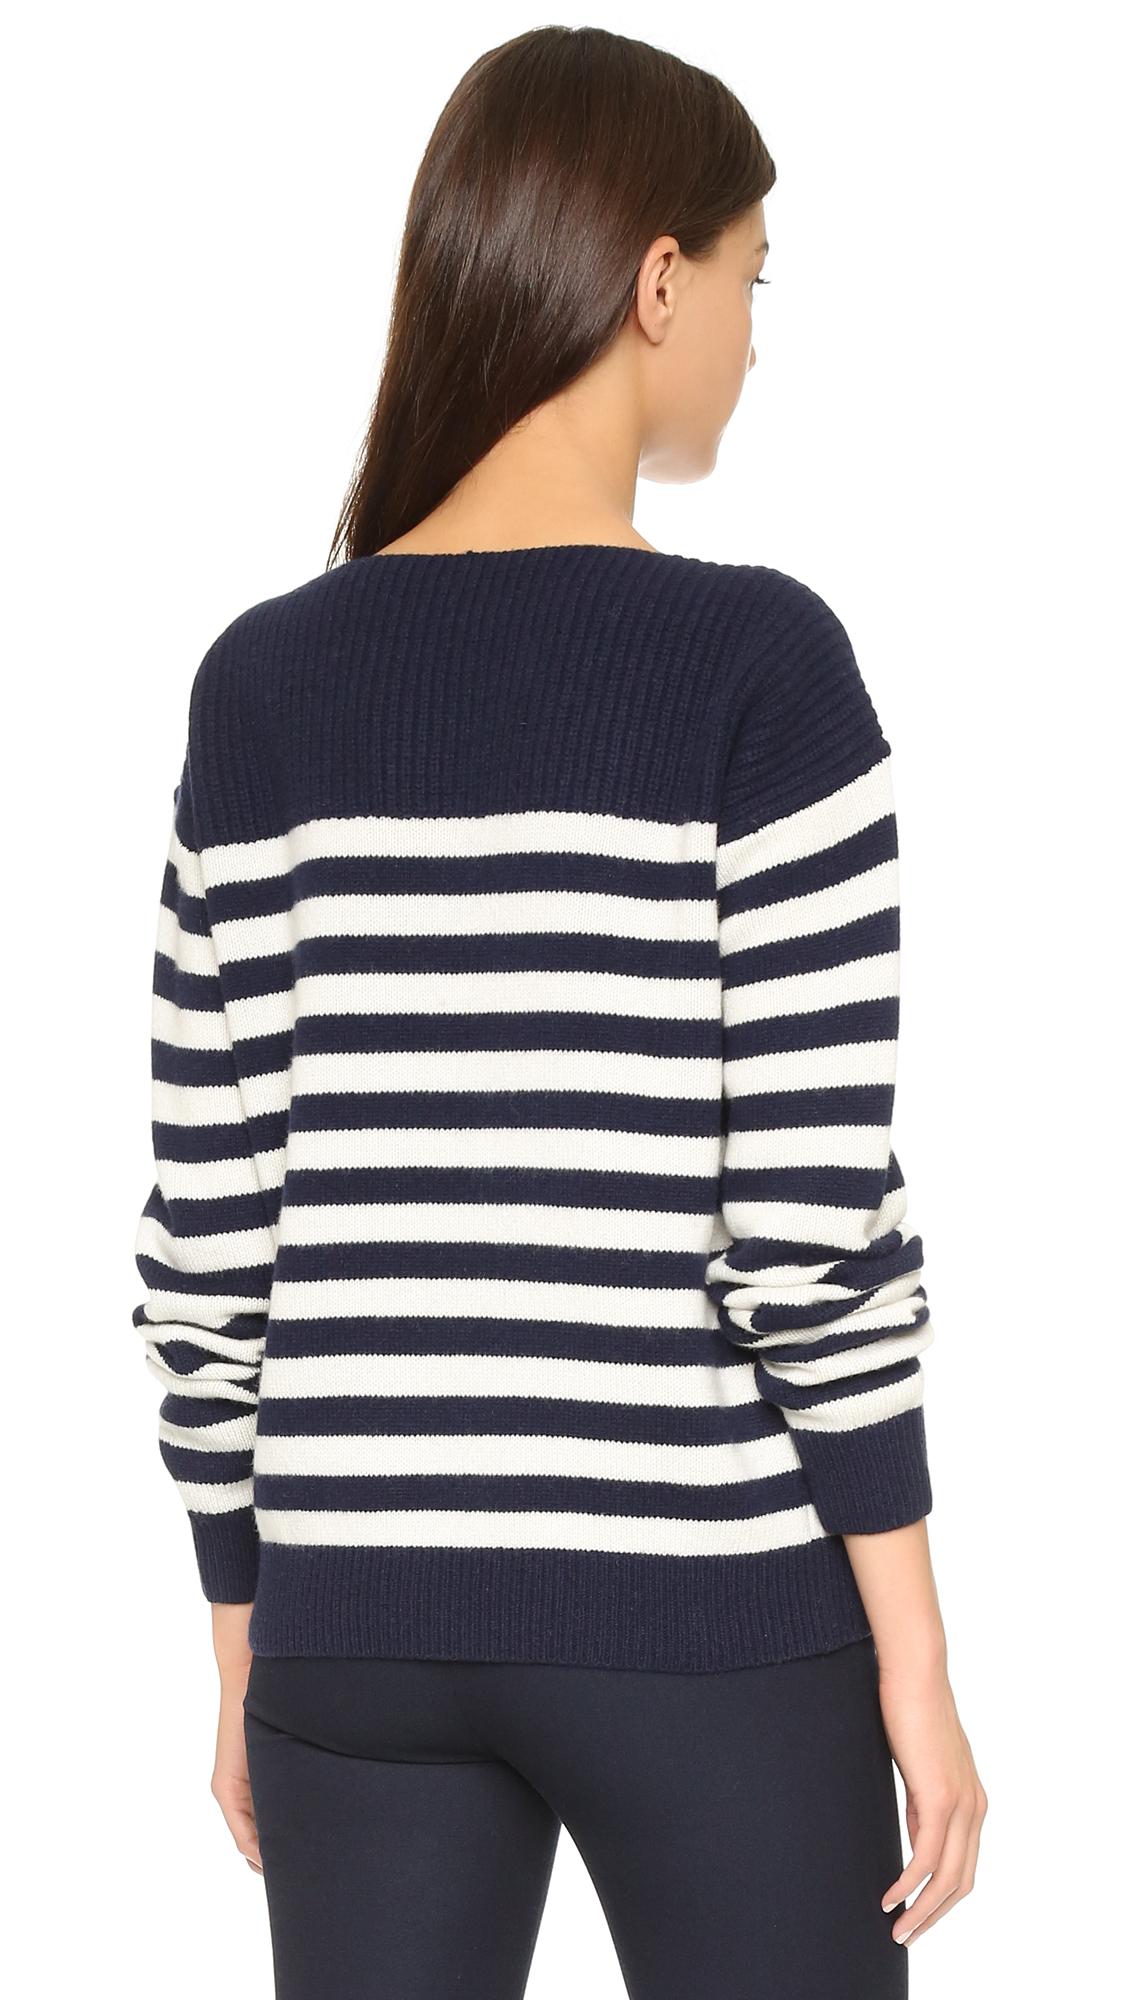 Joseph Sailor Sweater - Navy Ecru in Blue Lyst